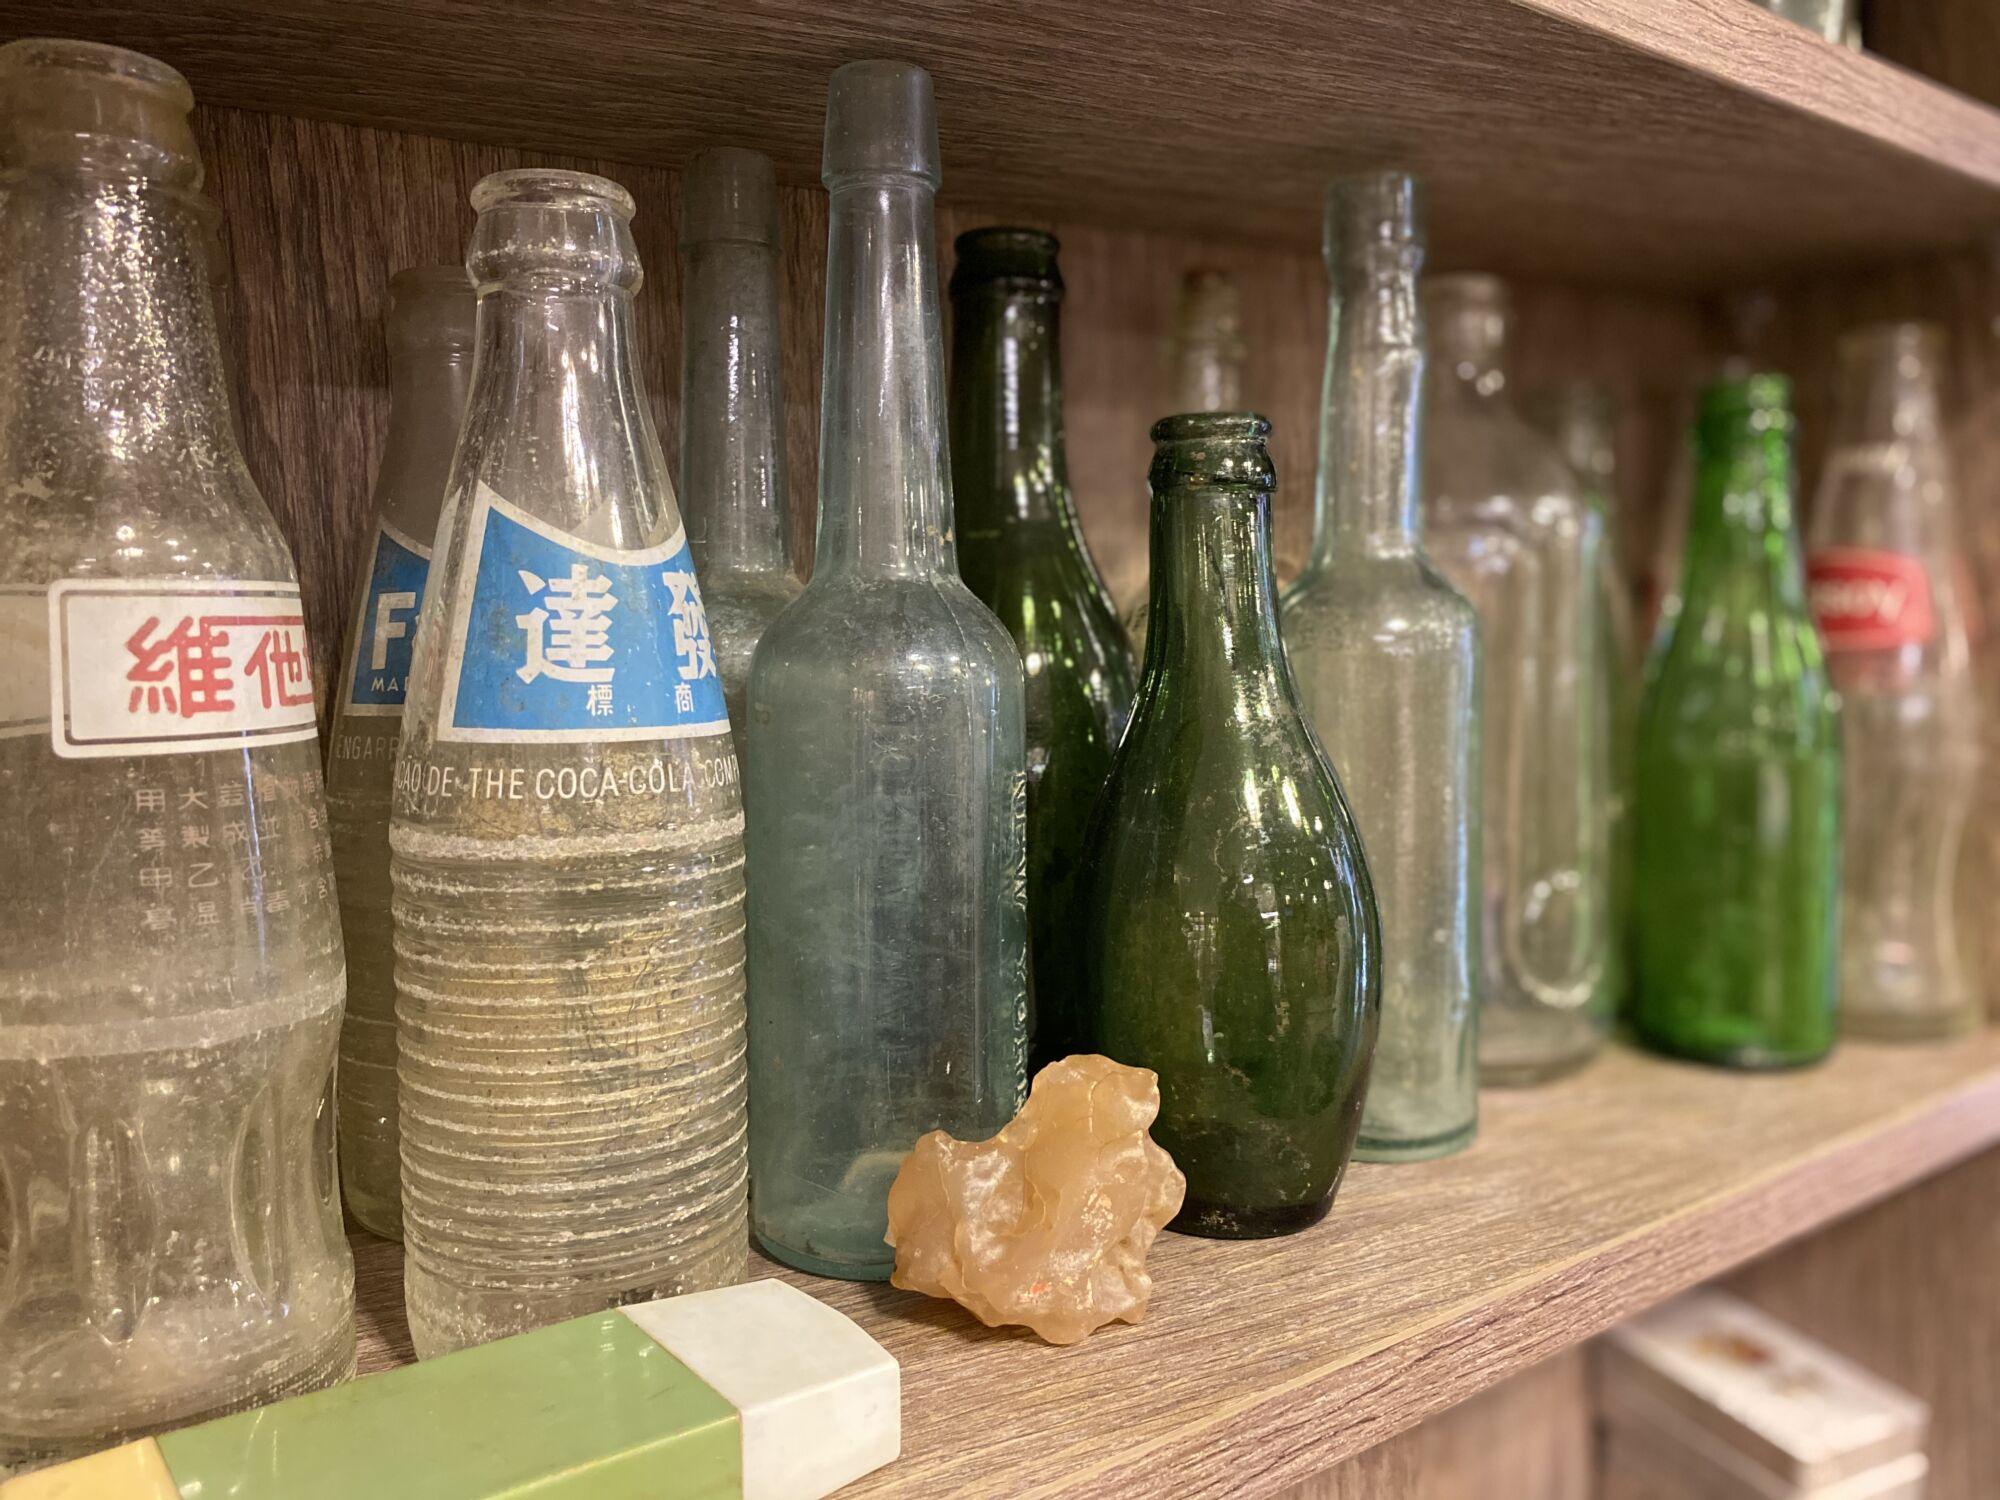 Lei Fong Old Bottles Macau Lifestyle